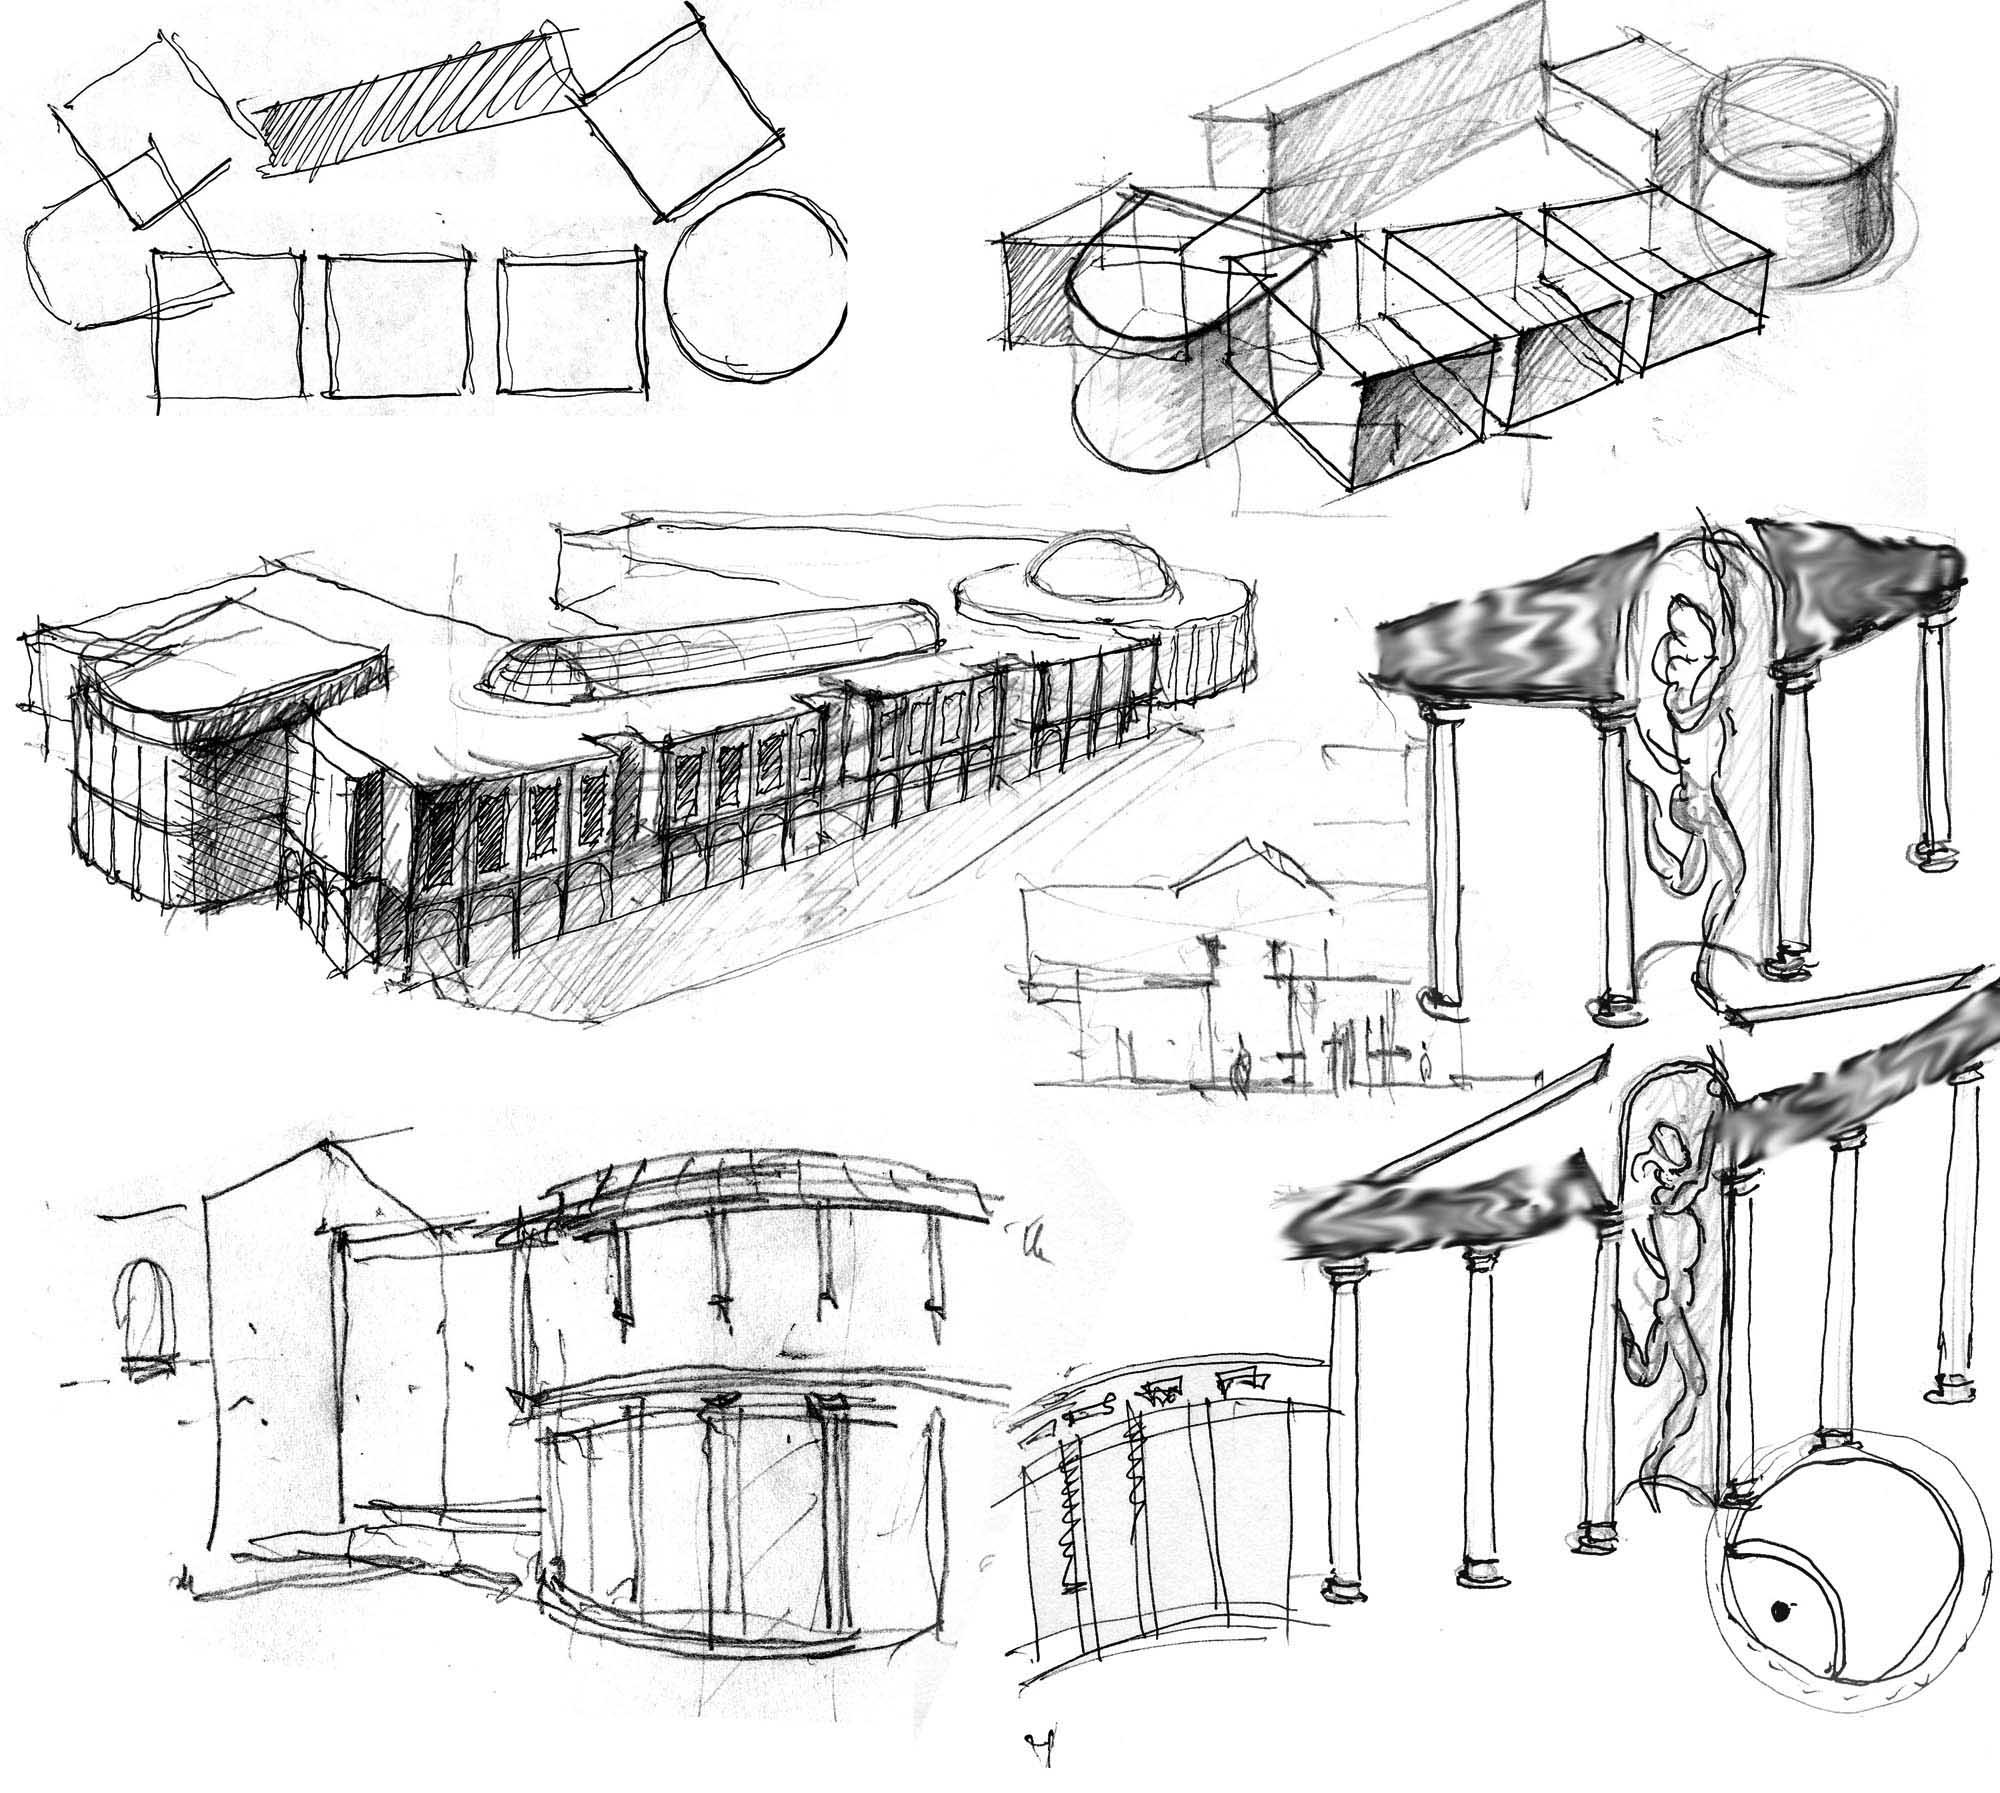 2000x1793 Degree Amp Profession Shopping Center Aleksandr Dronov